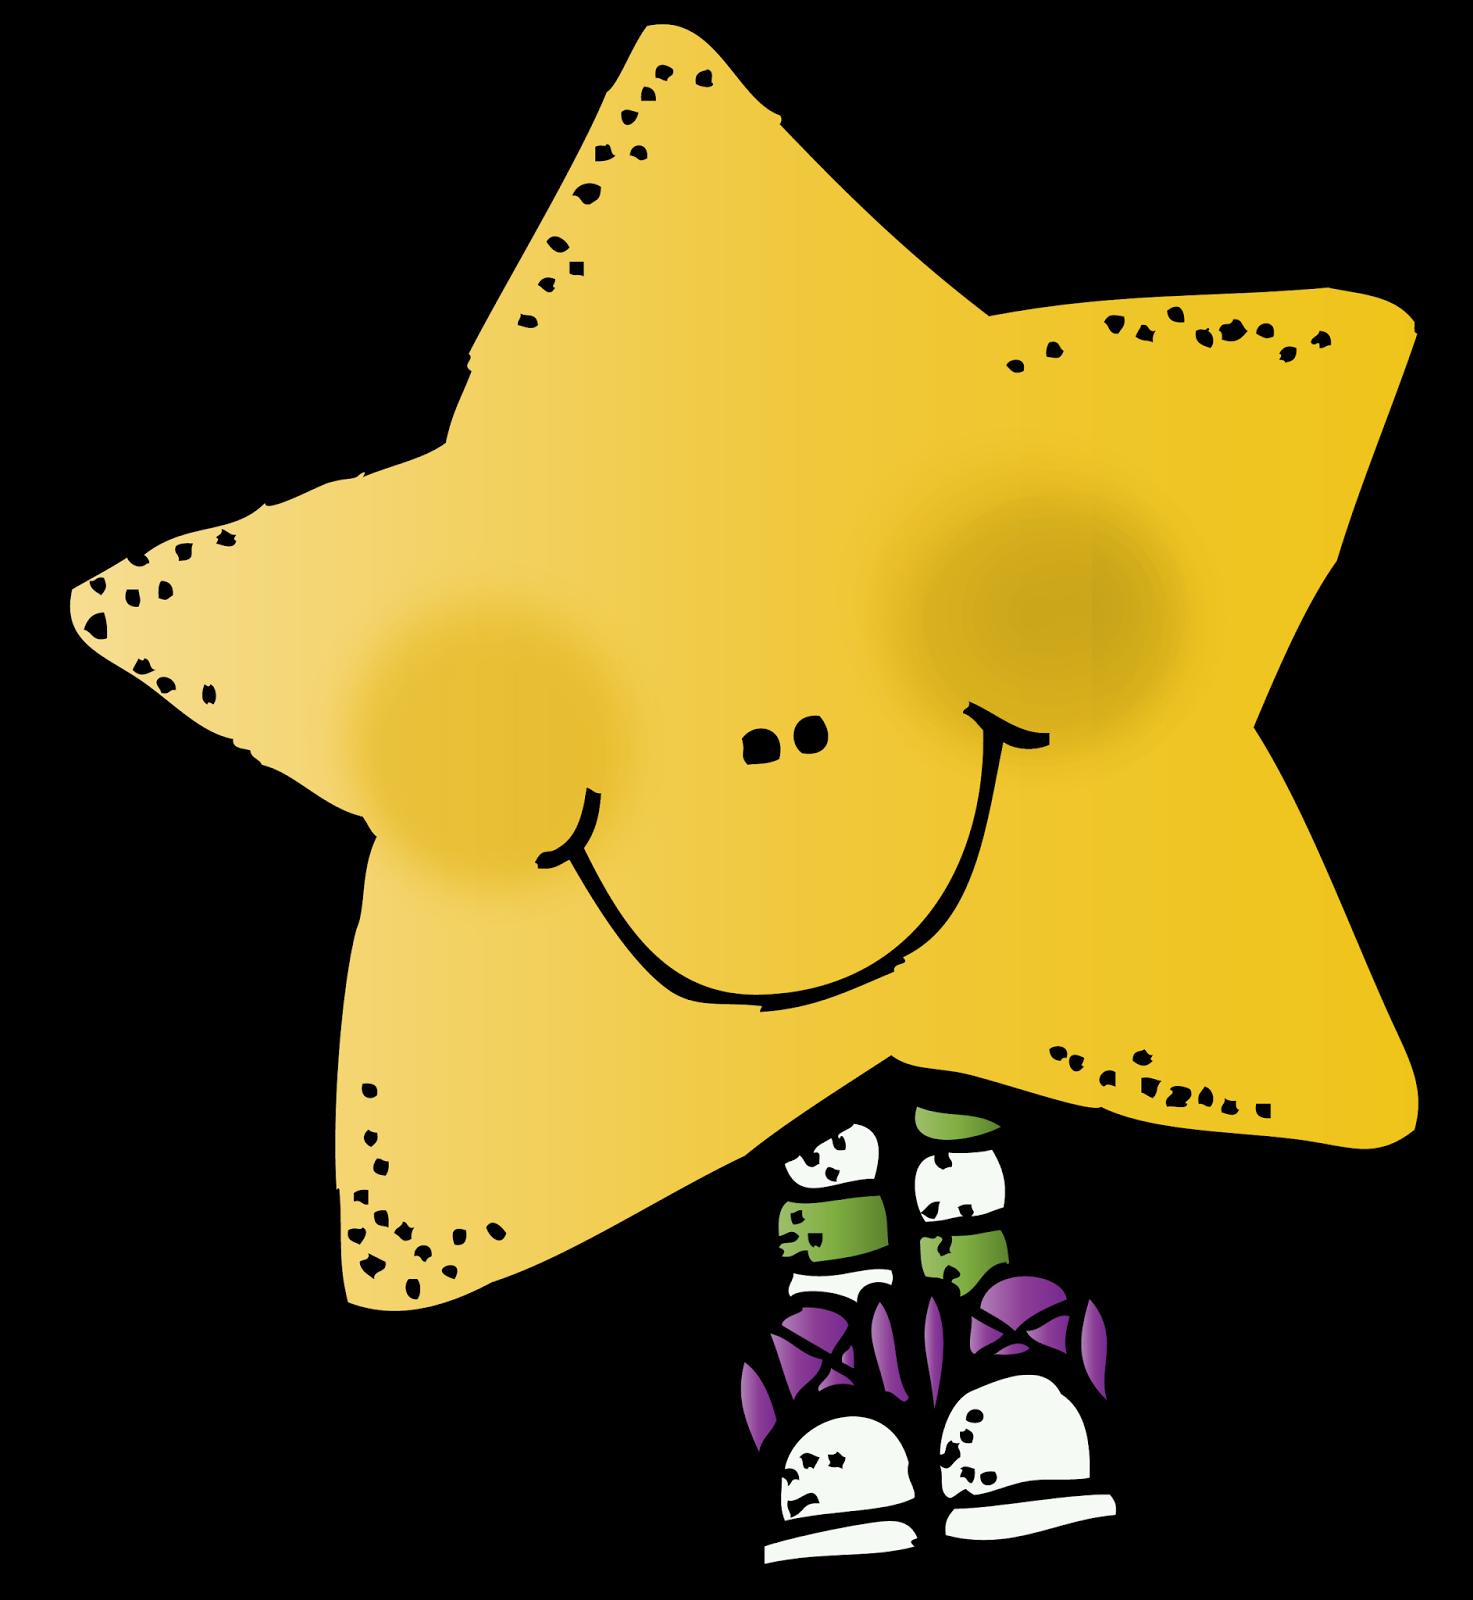 Star reward clipart jpg transparent download Melonheadz clipart star - Hanslodge Cliparts jpg transparent download